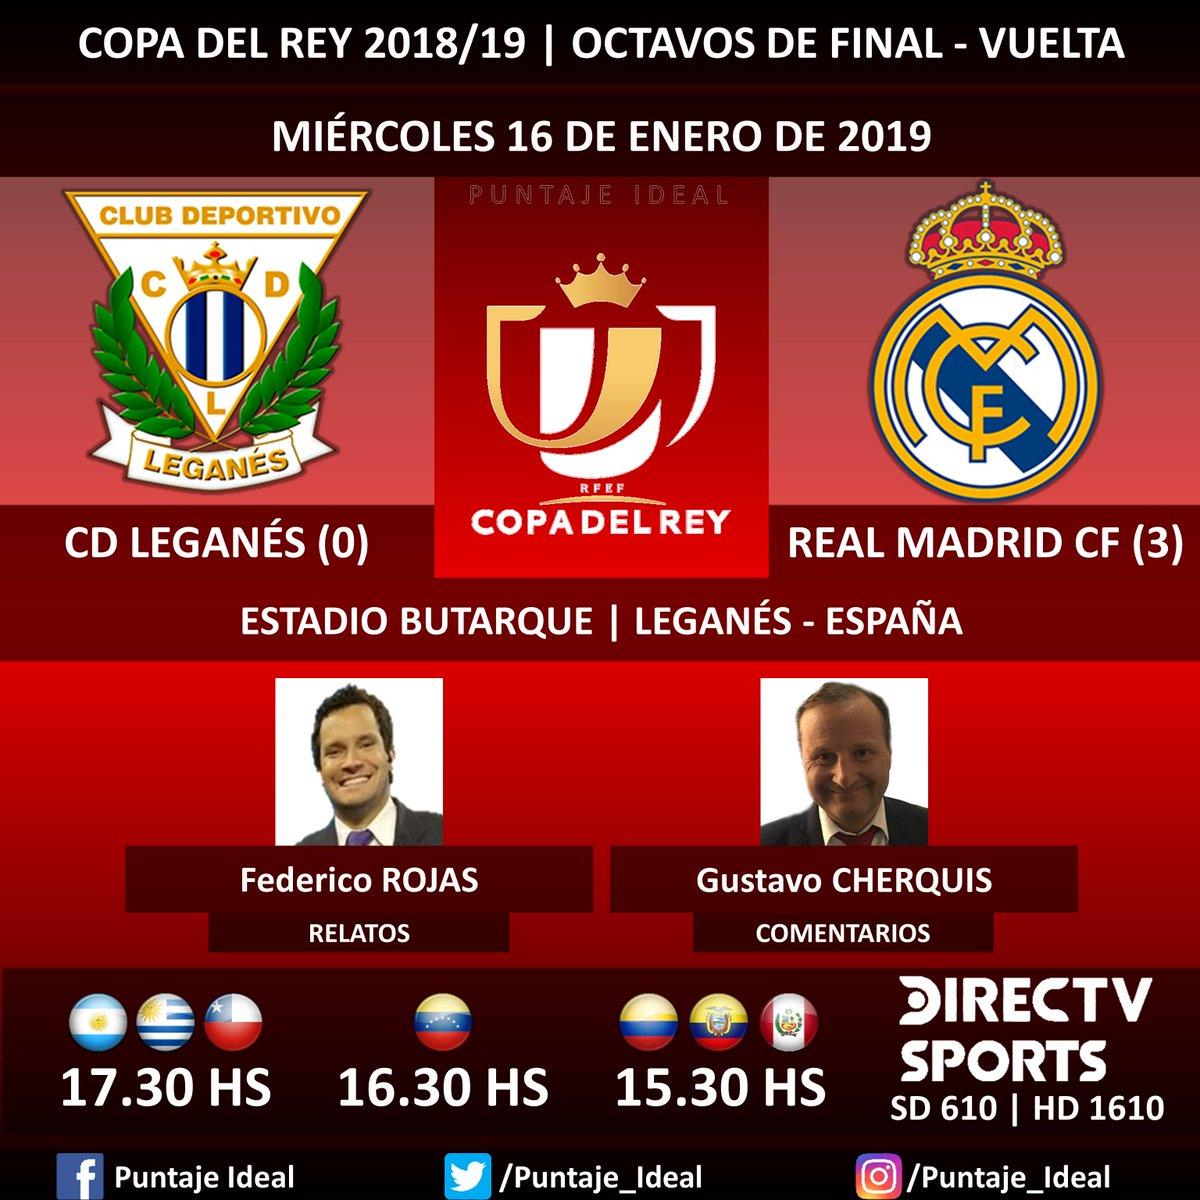 ⚽ #FútbolEnDIRECTV   #CDLeganés vs. #RealMadridCF 🎙 Relatos: @FDVENE  🎙 Comentarios: @Gustavo_che  📺 TV: @DIRECTVSports Sudamérica (610 - 1610 HD) - #Torneos 🤳 #SoySportista - #CopaDelRey 🇪🇸 - #LeganésRealMadrid  Dale RT 🔃